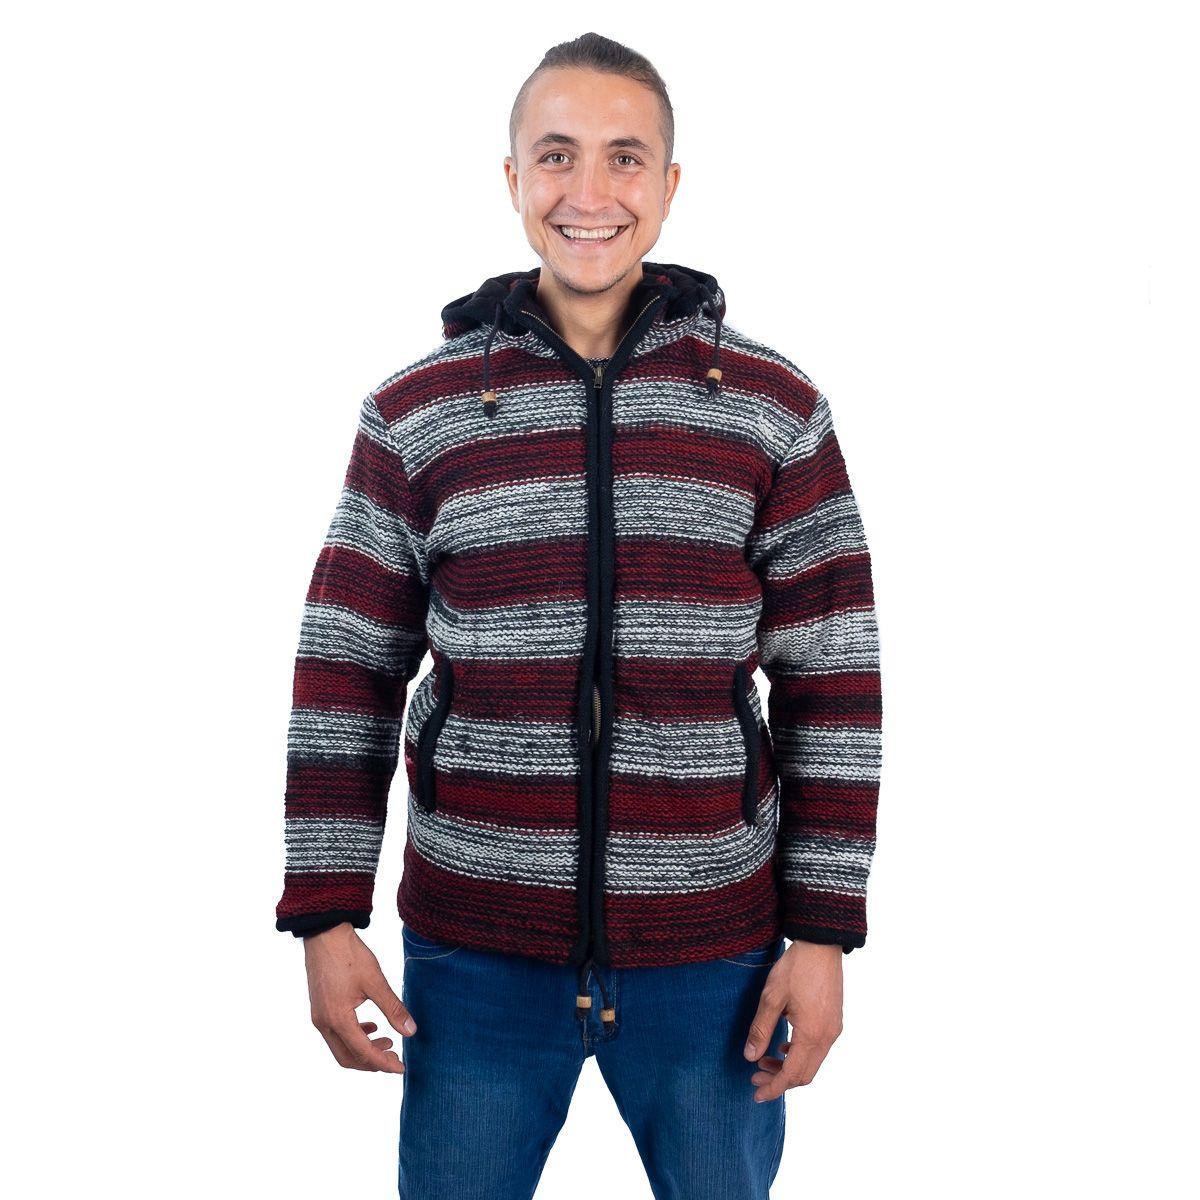 Woollen sweater Misty Horizon Nepal